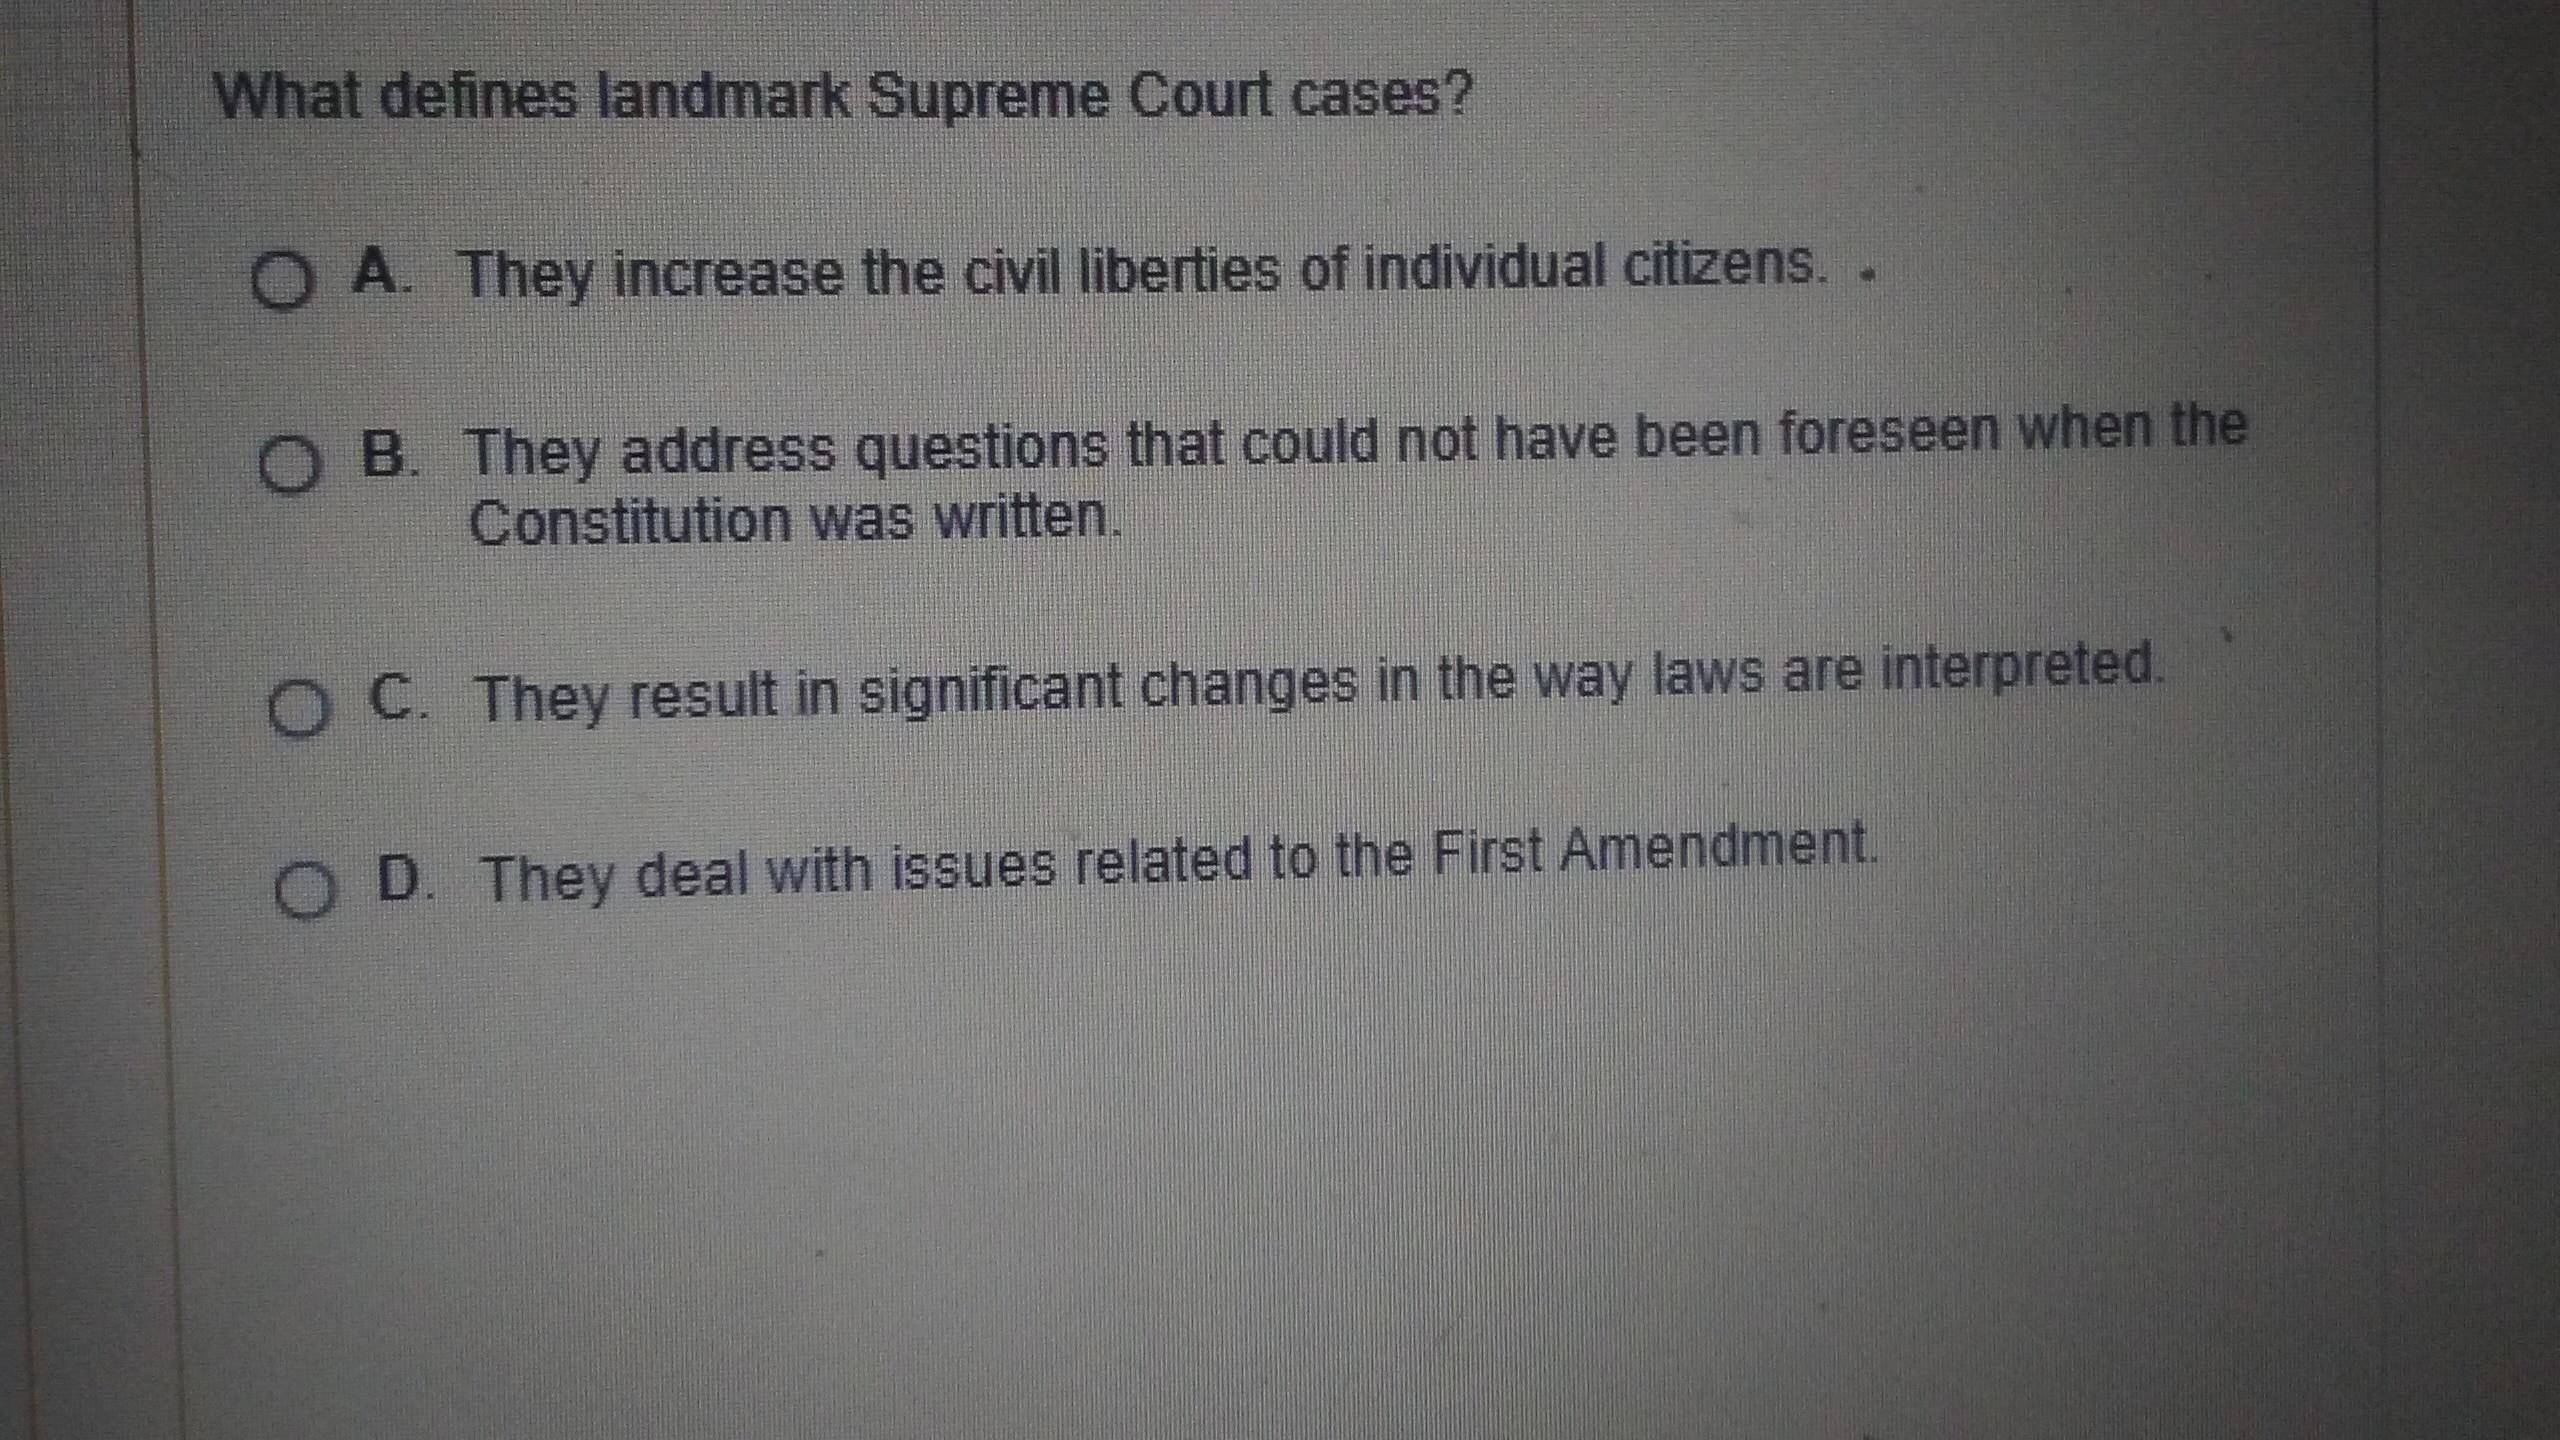 What Defines Landmark Supreme Court Cases